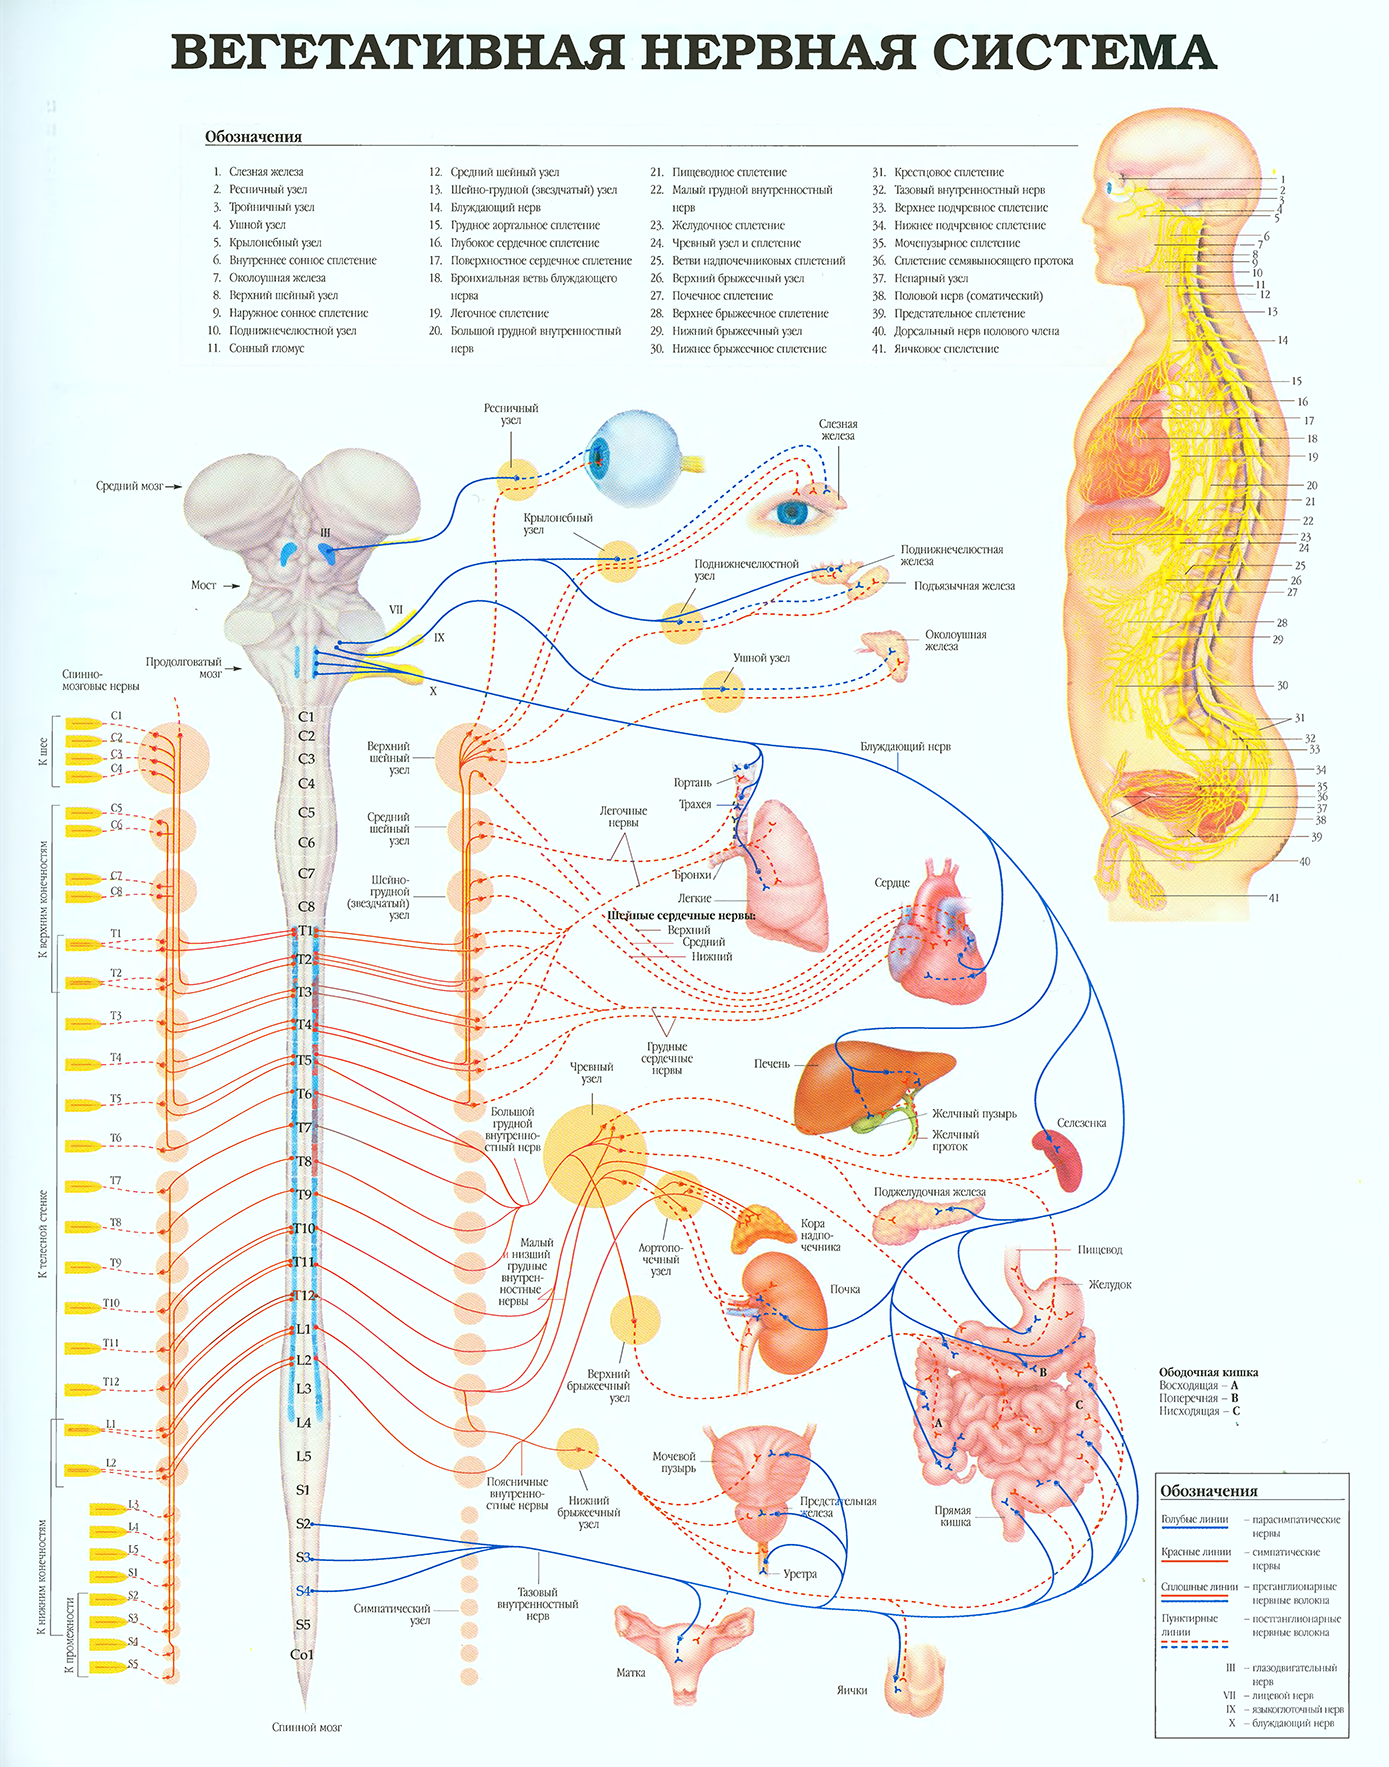 storenie-cheloveka-Вегетативная-нервная-система